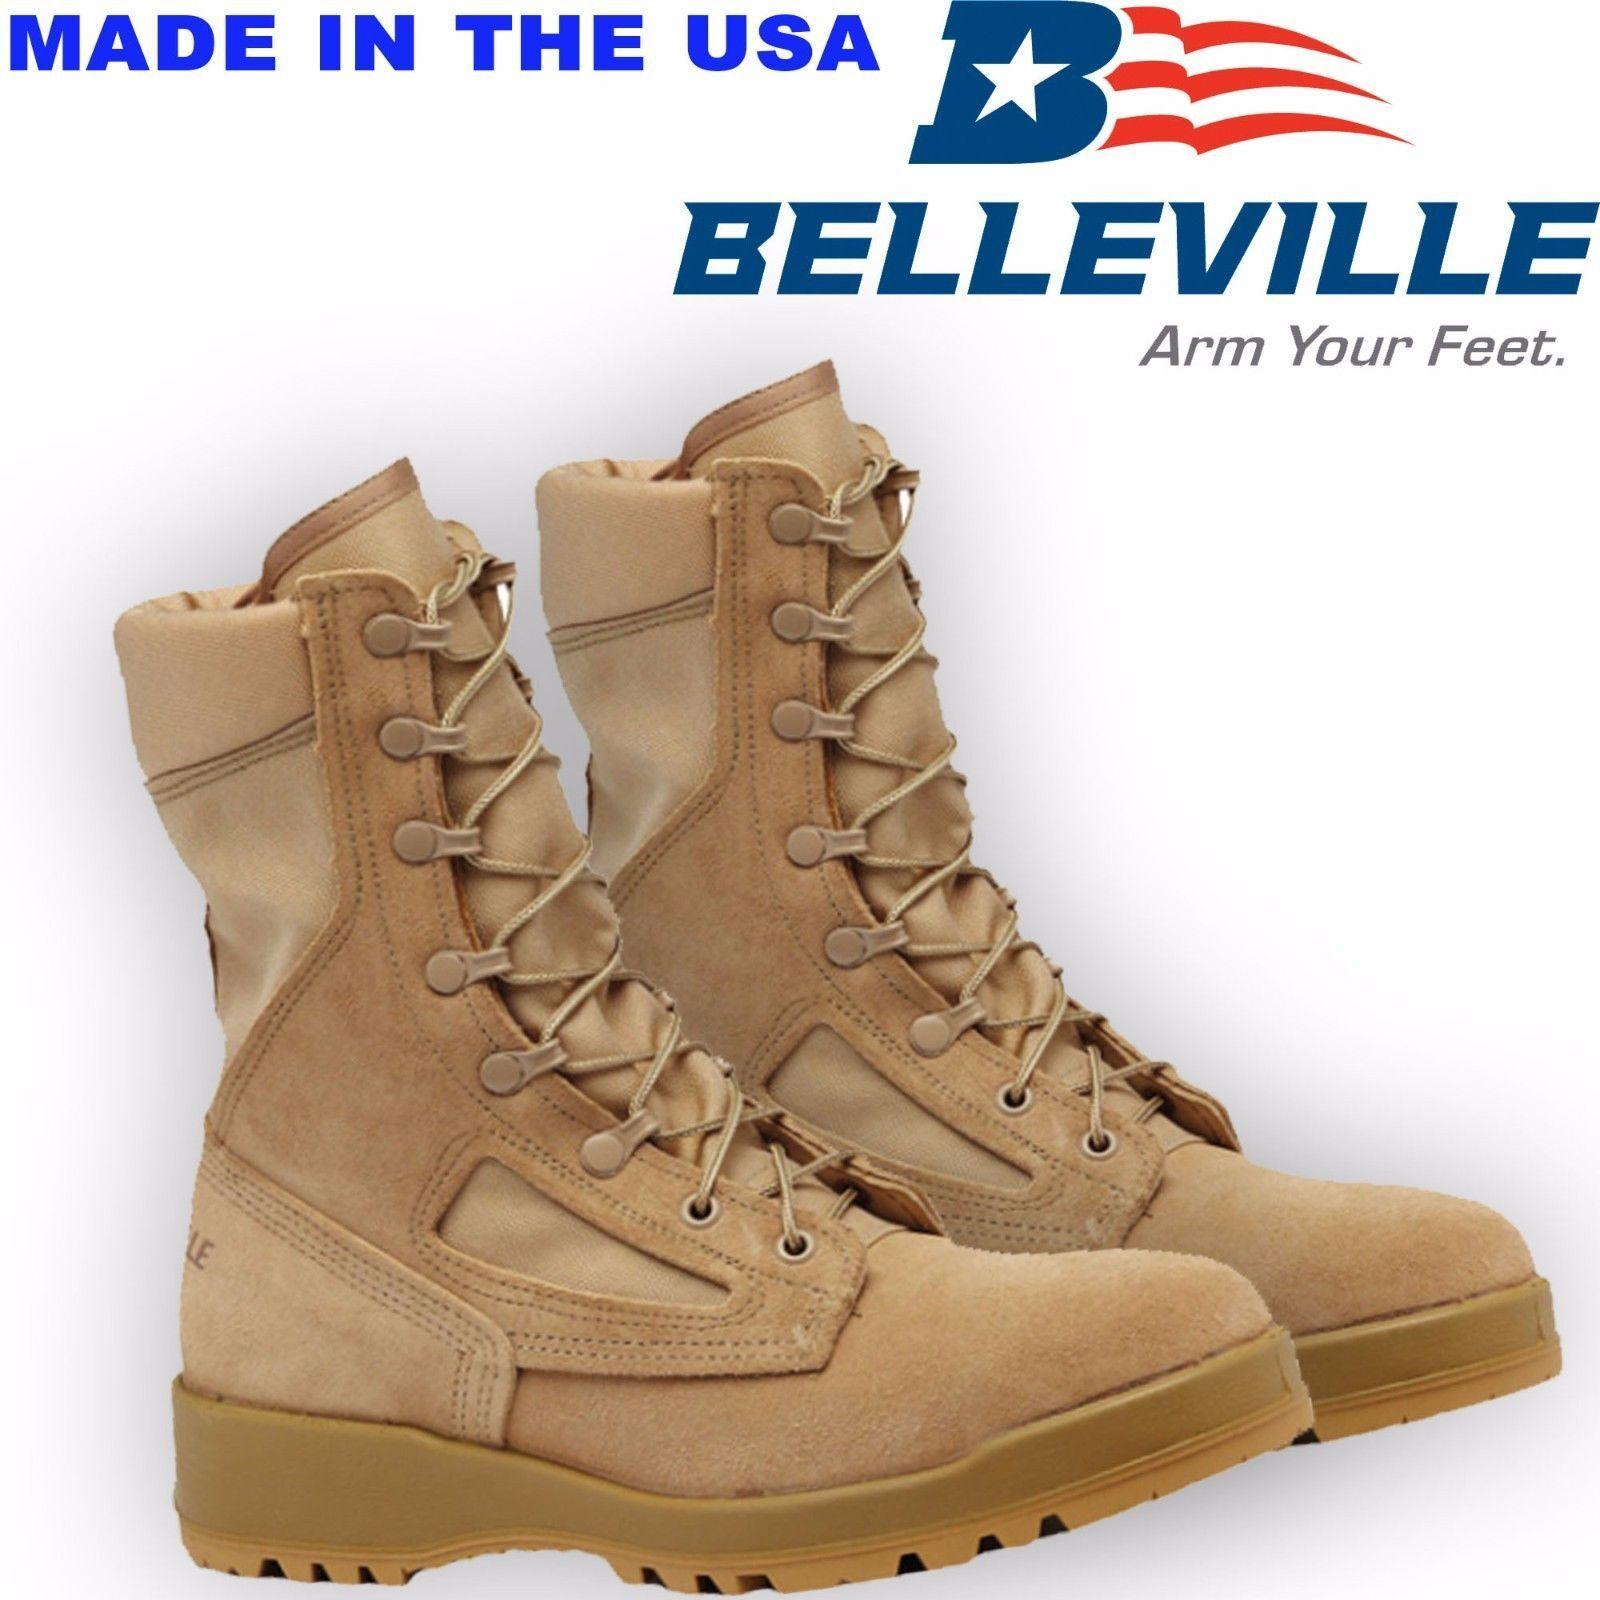 Genuine US Army Belleville 340 Boots Desert Hot Weather Flight/Combat Boots 340 984229